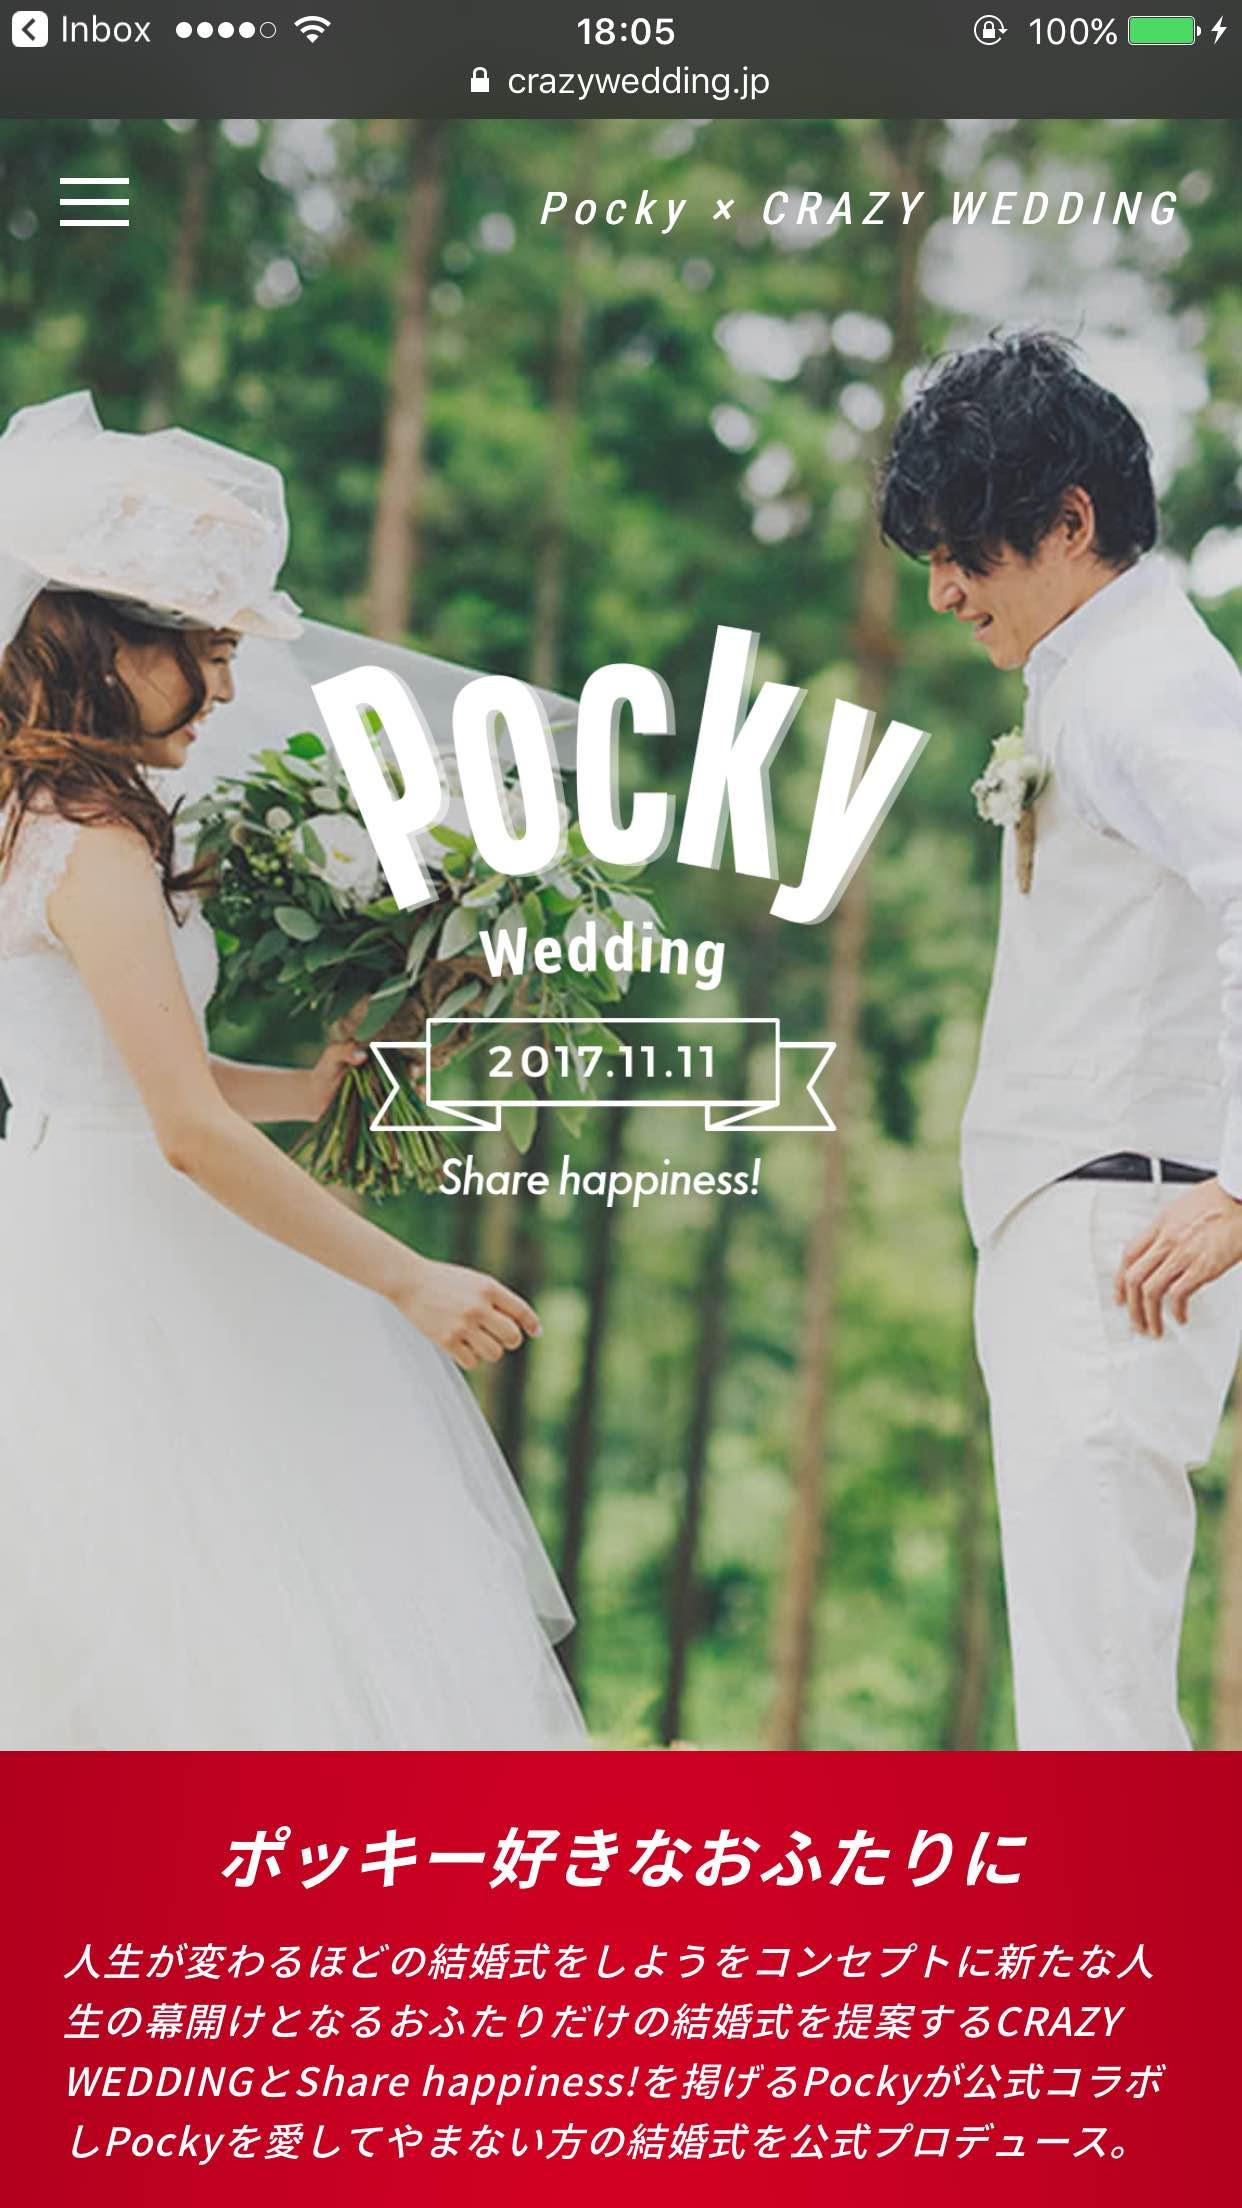 Pocky × CRAZY WEDDING|ポッキーウェディング